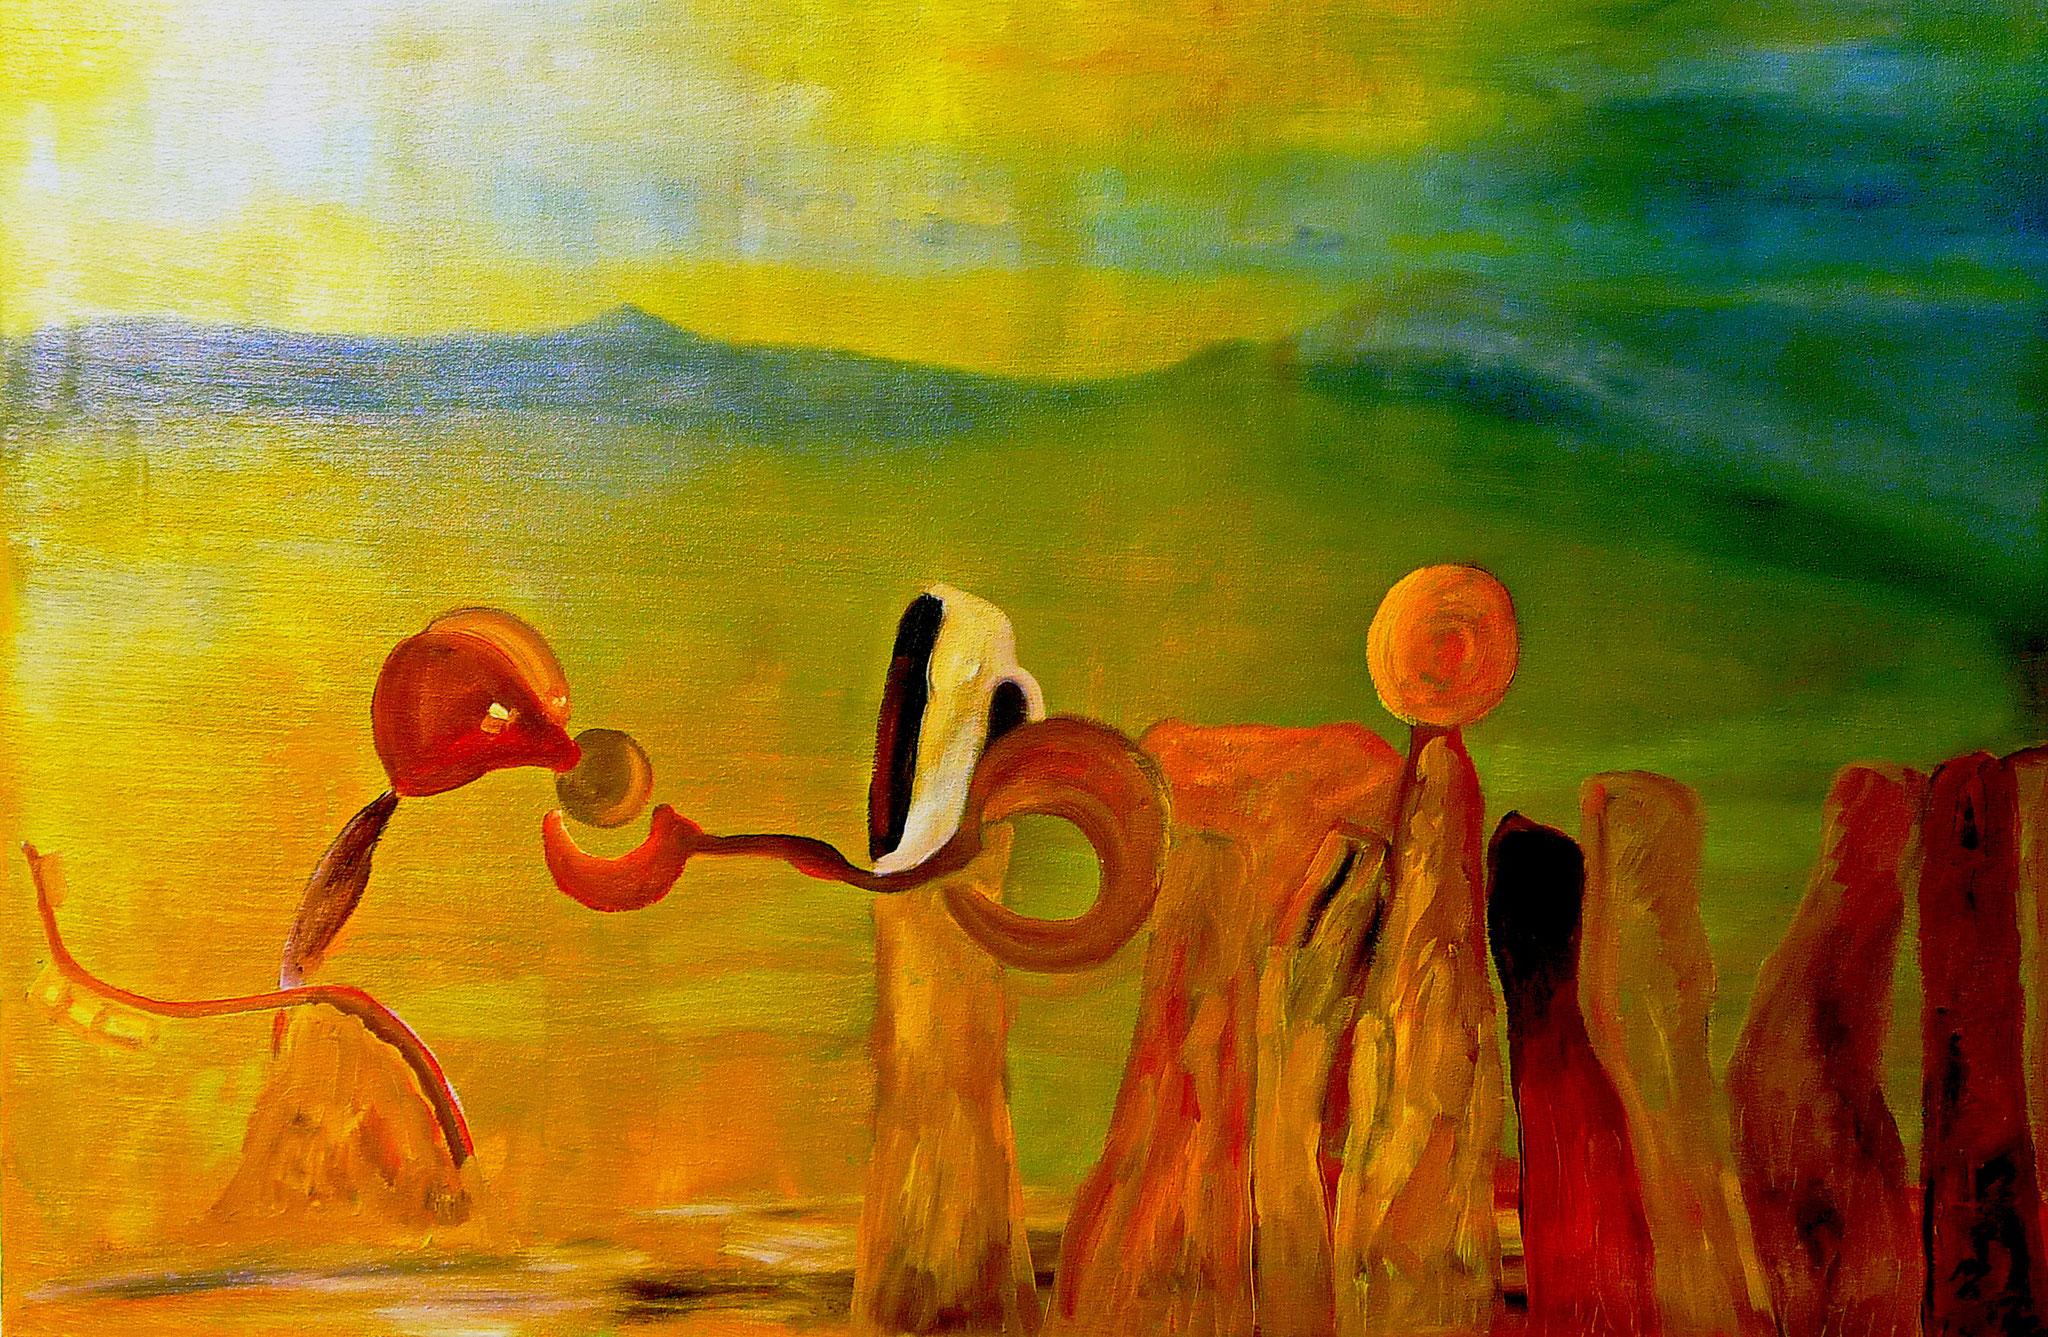 """Unser Alltag""___oil on canvas___900 x 600 mm"